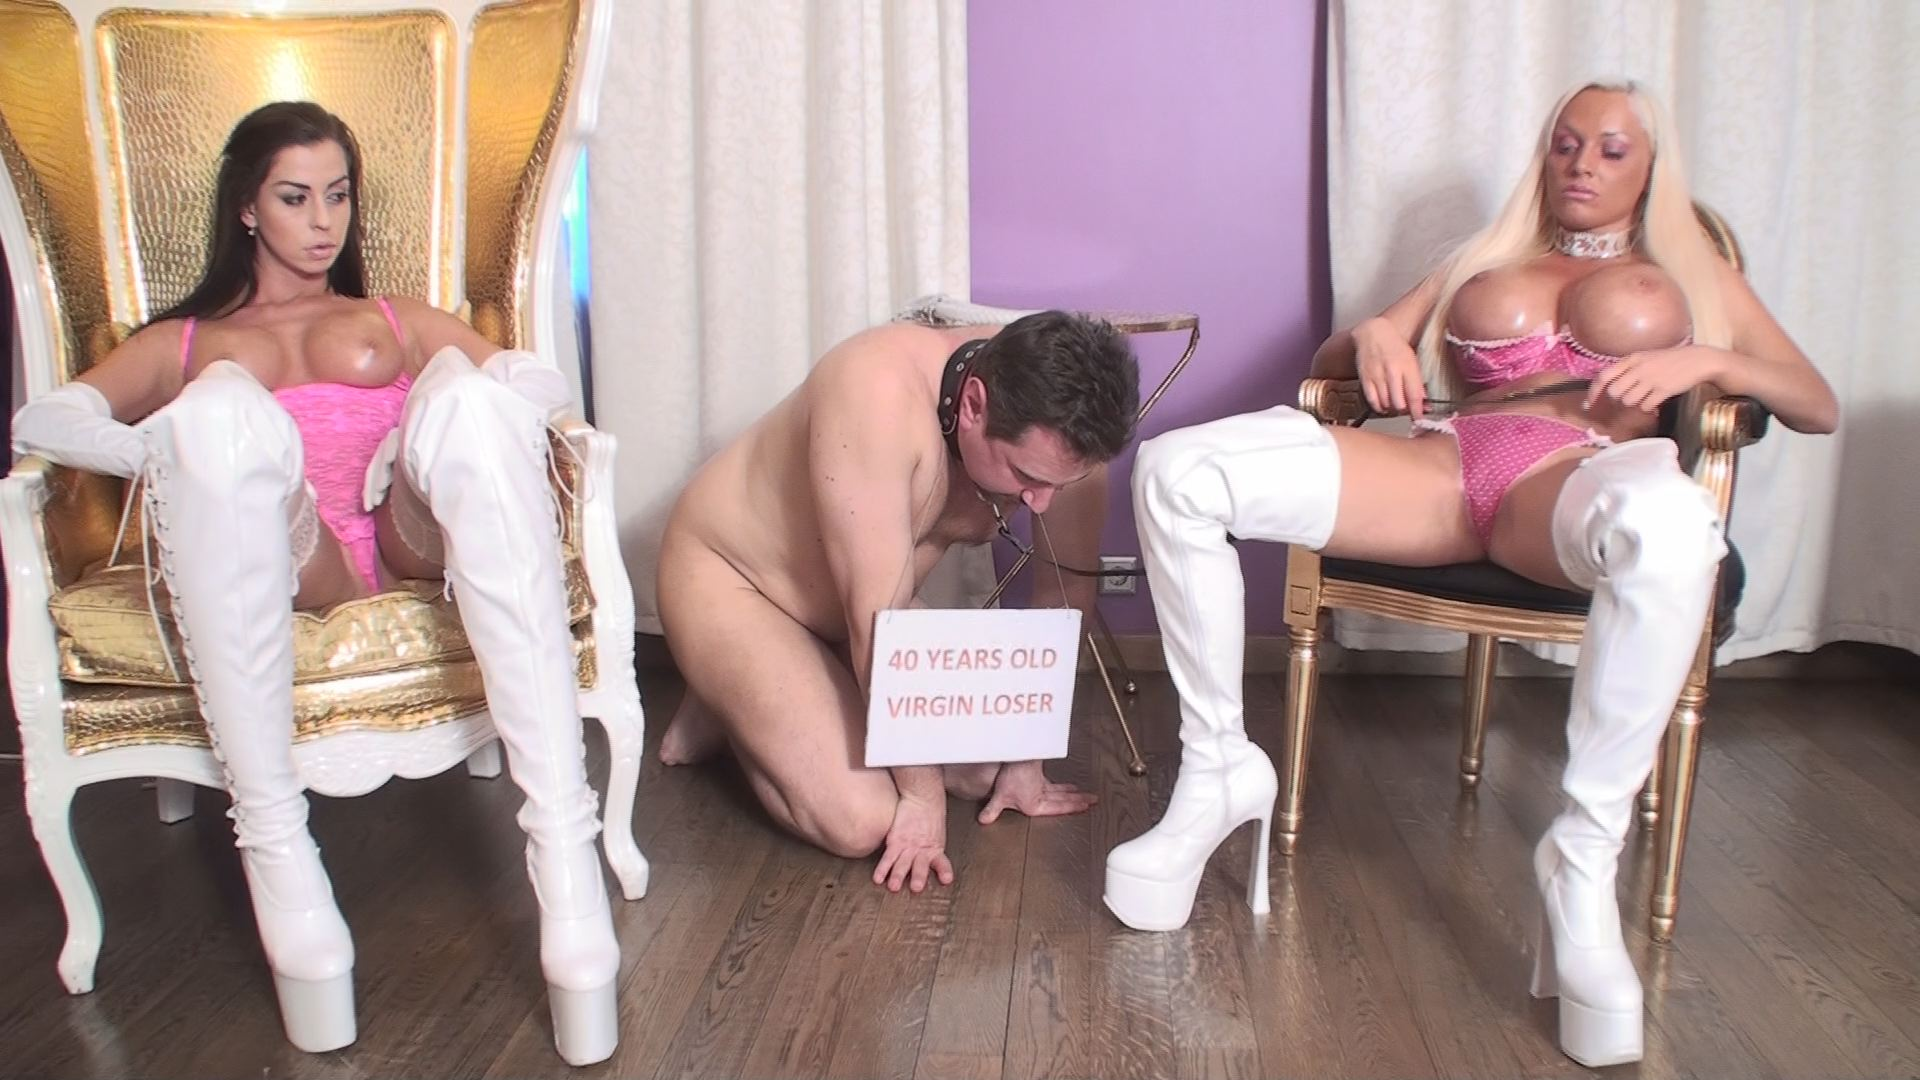 Humiliation 118